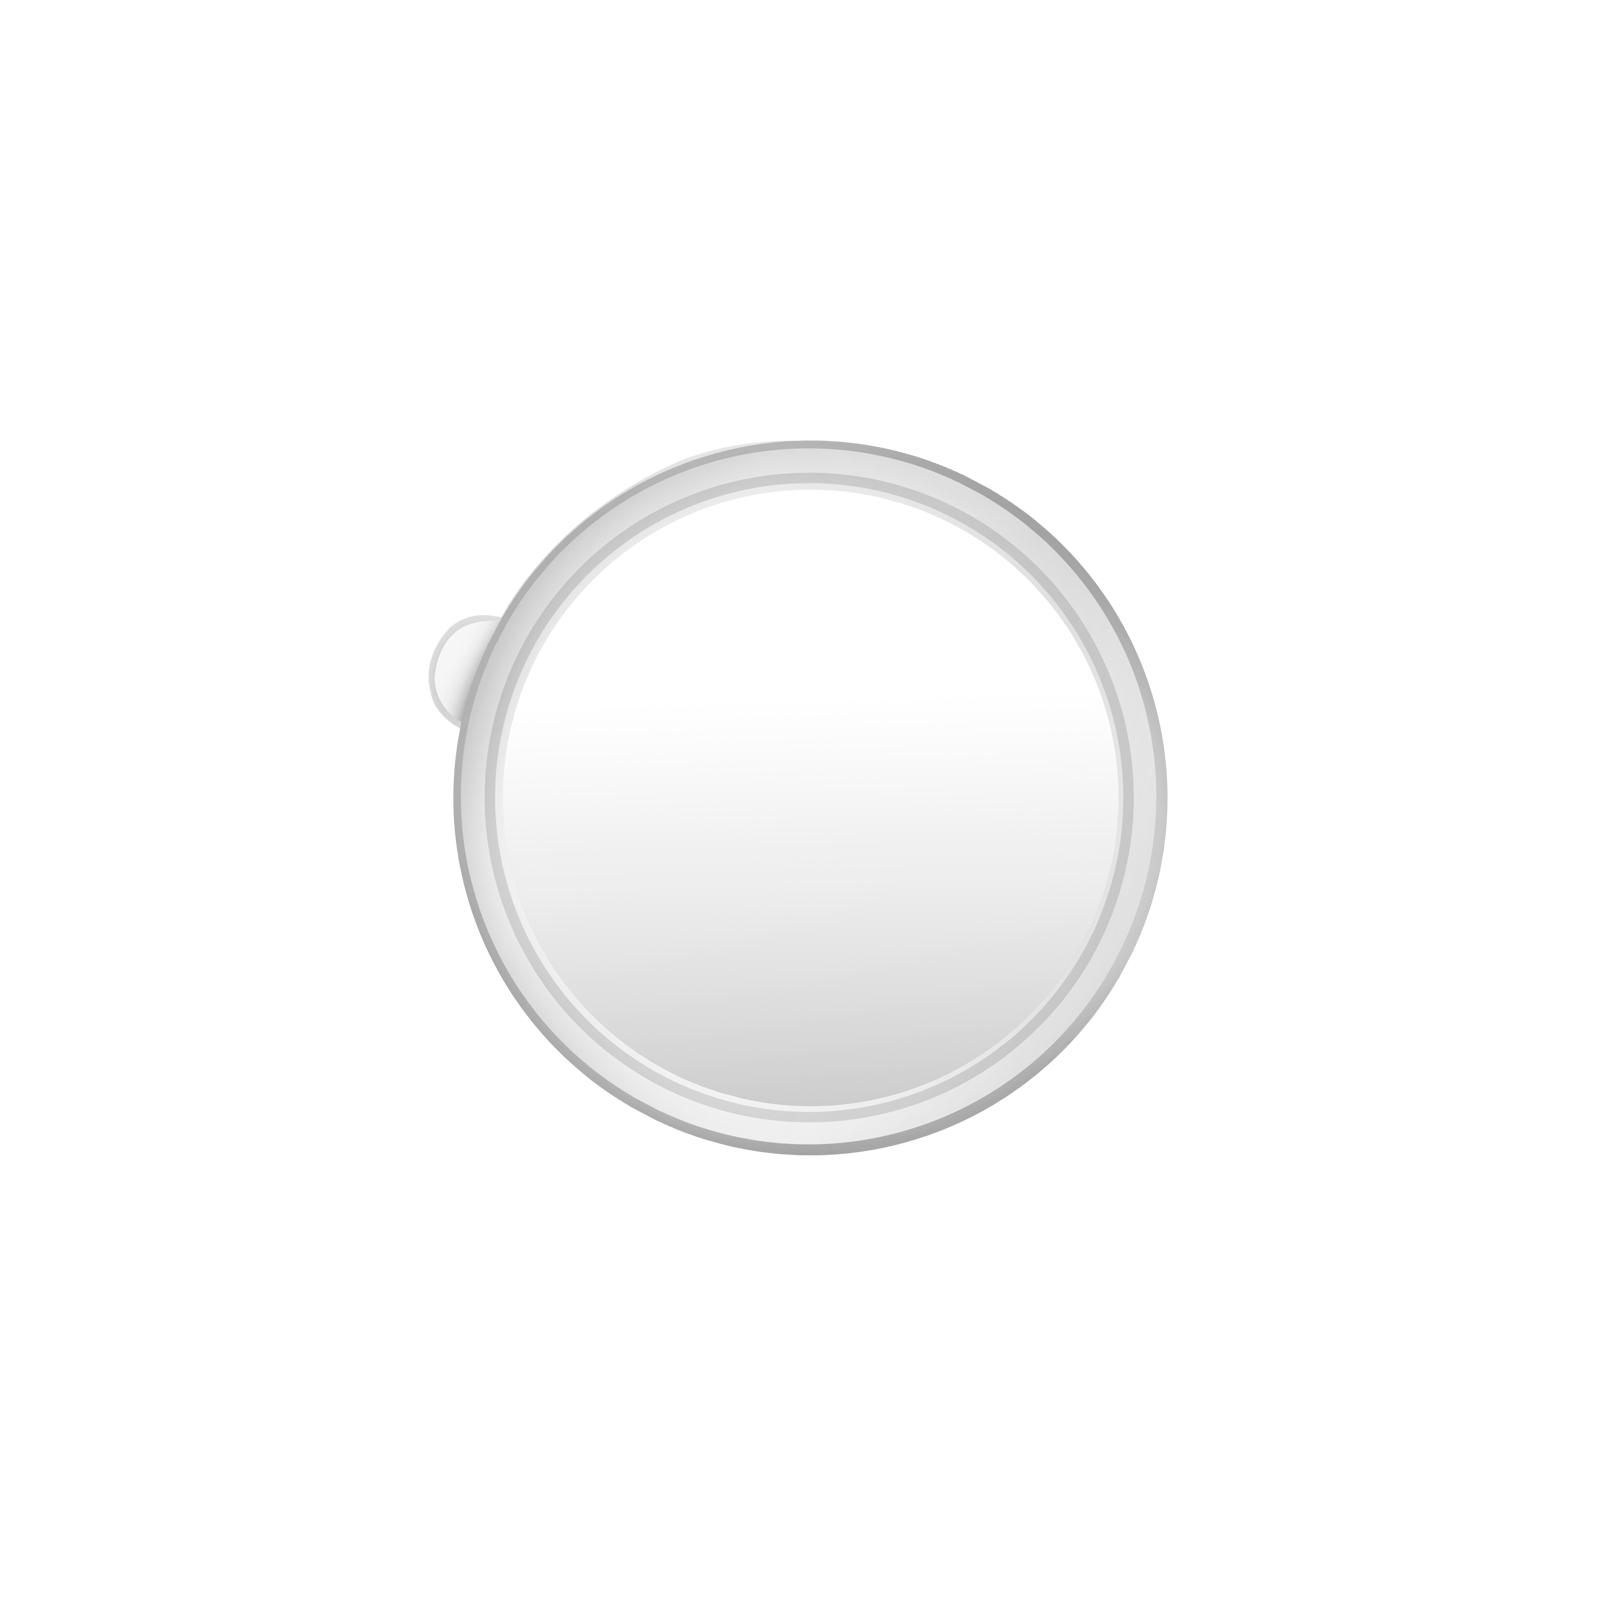 Аксессуар к мультиваркам DEX DTC-2/01